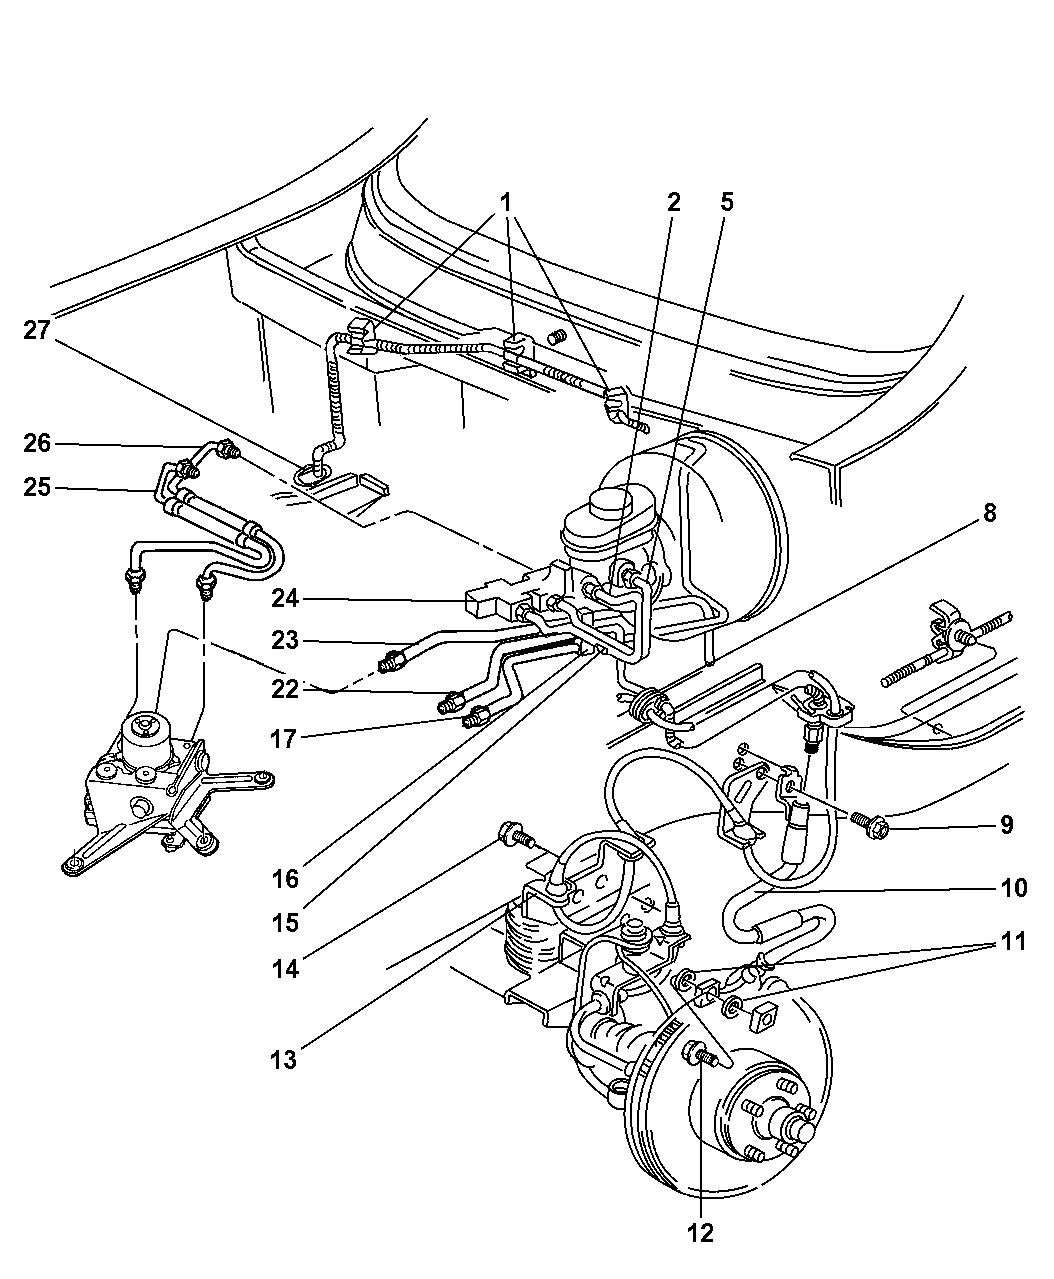 Wiring Diagram Jeep Grand Cherokee 2002